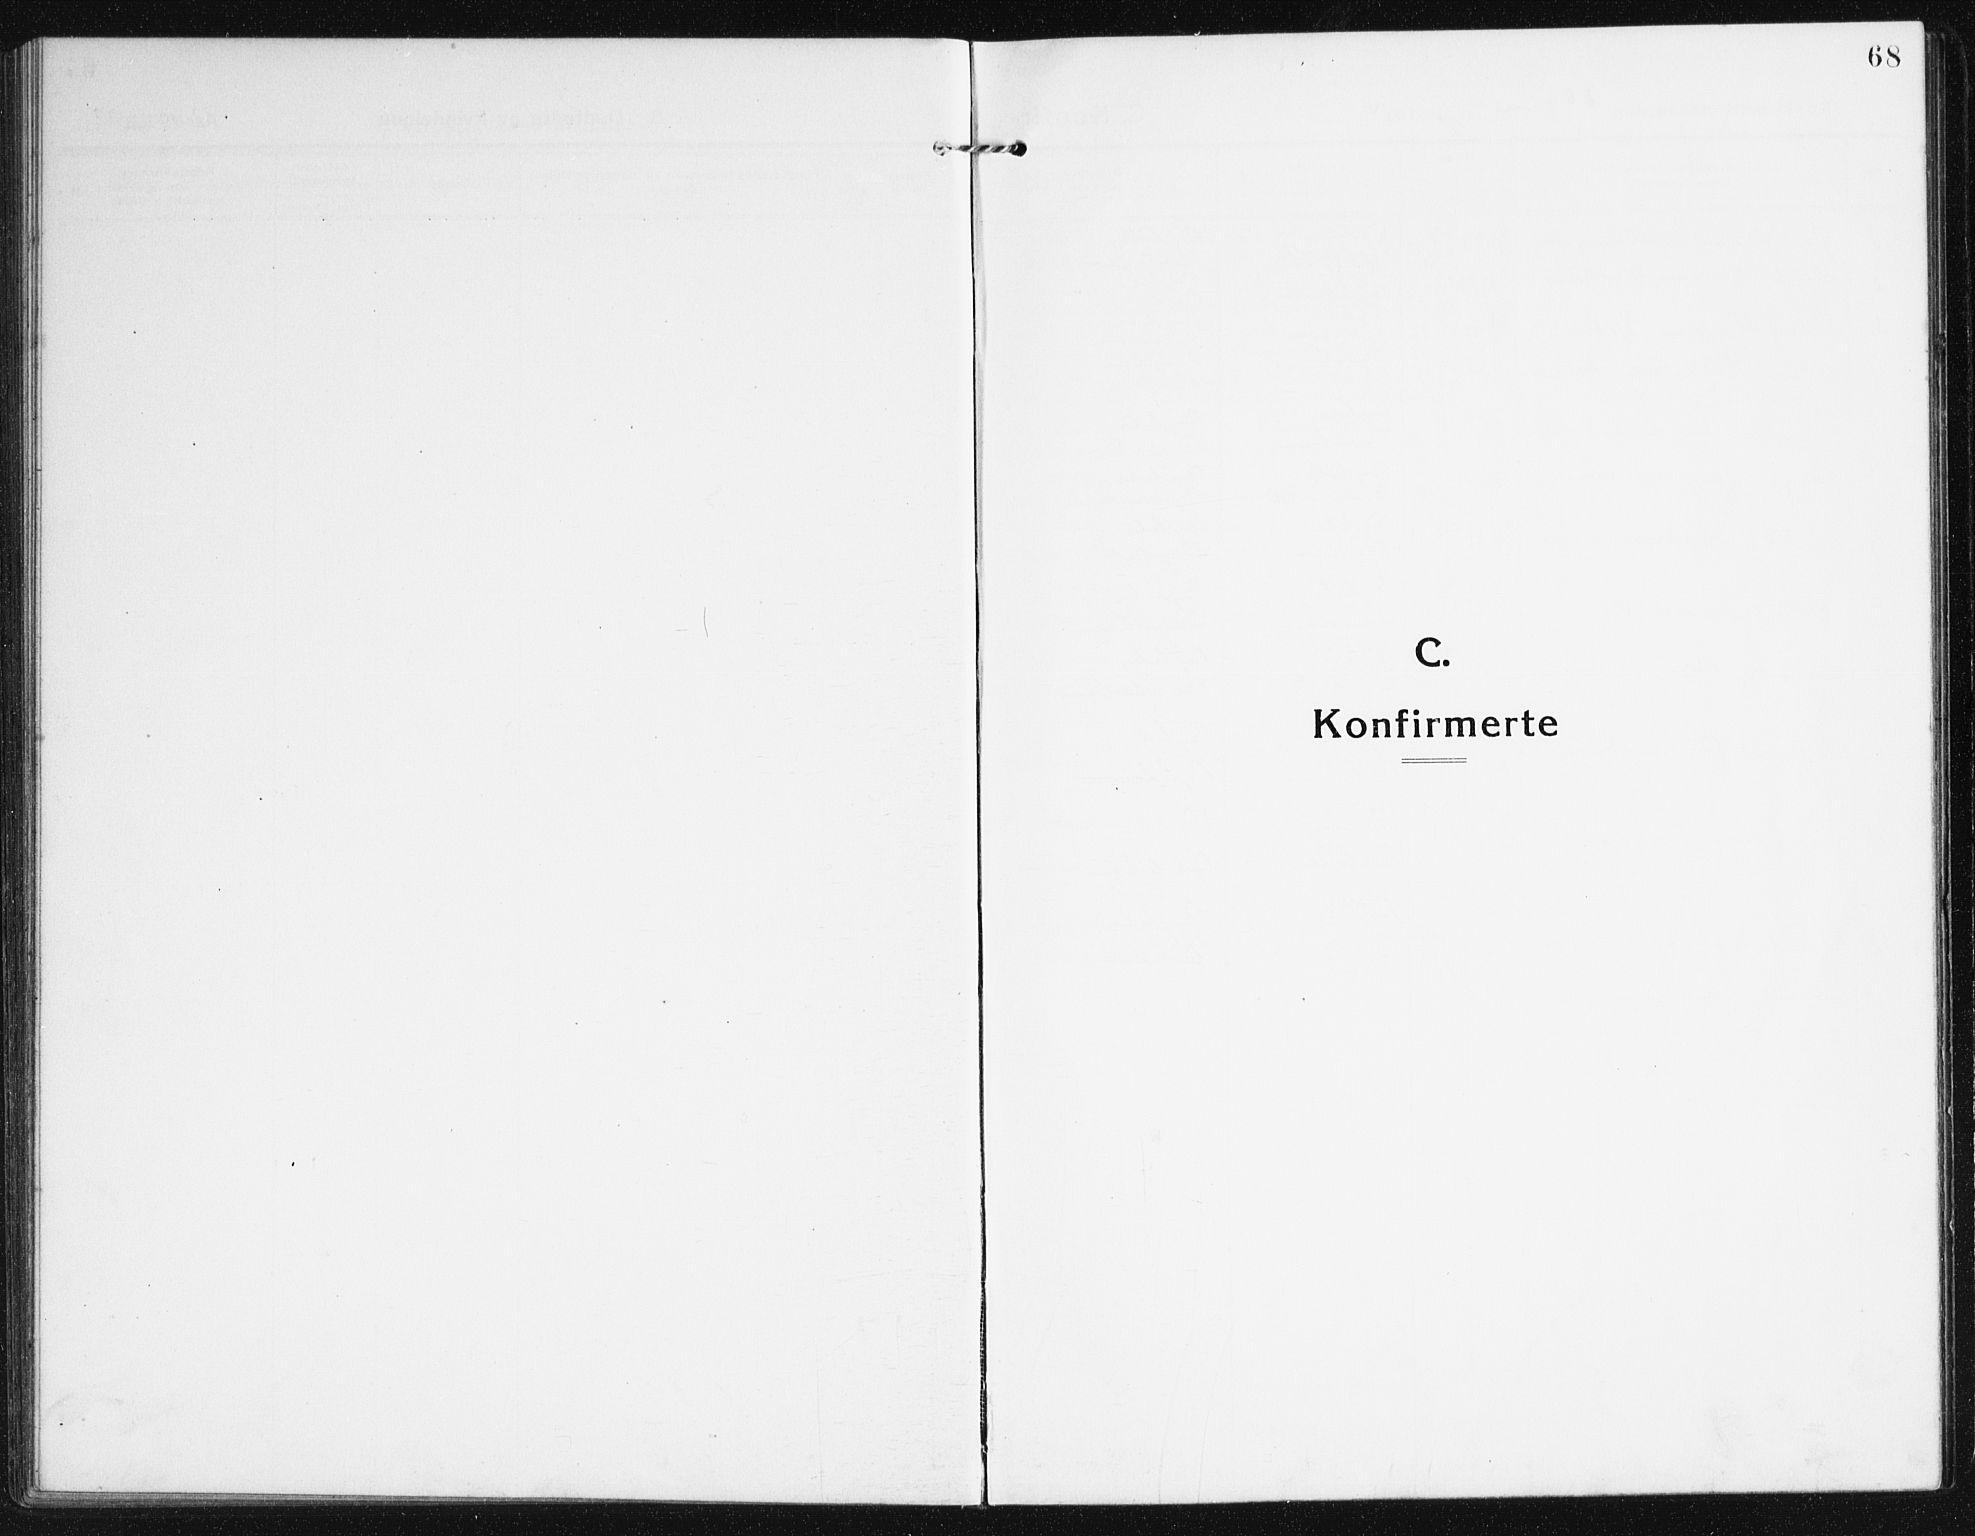 SAK, Valle sokneprestkontor, F/Fb/Fba/L0004: Klokkerbok nr. B 4, 1917-1944, s. 68